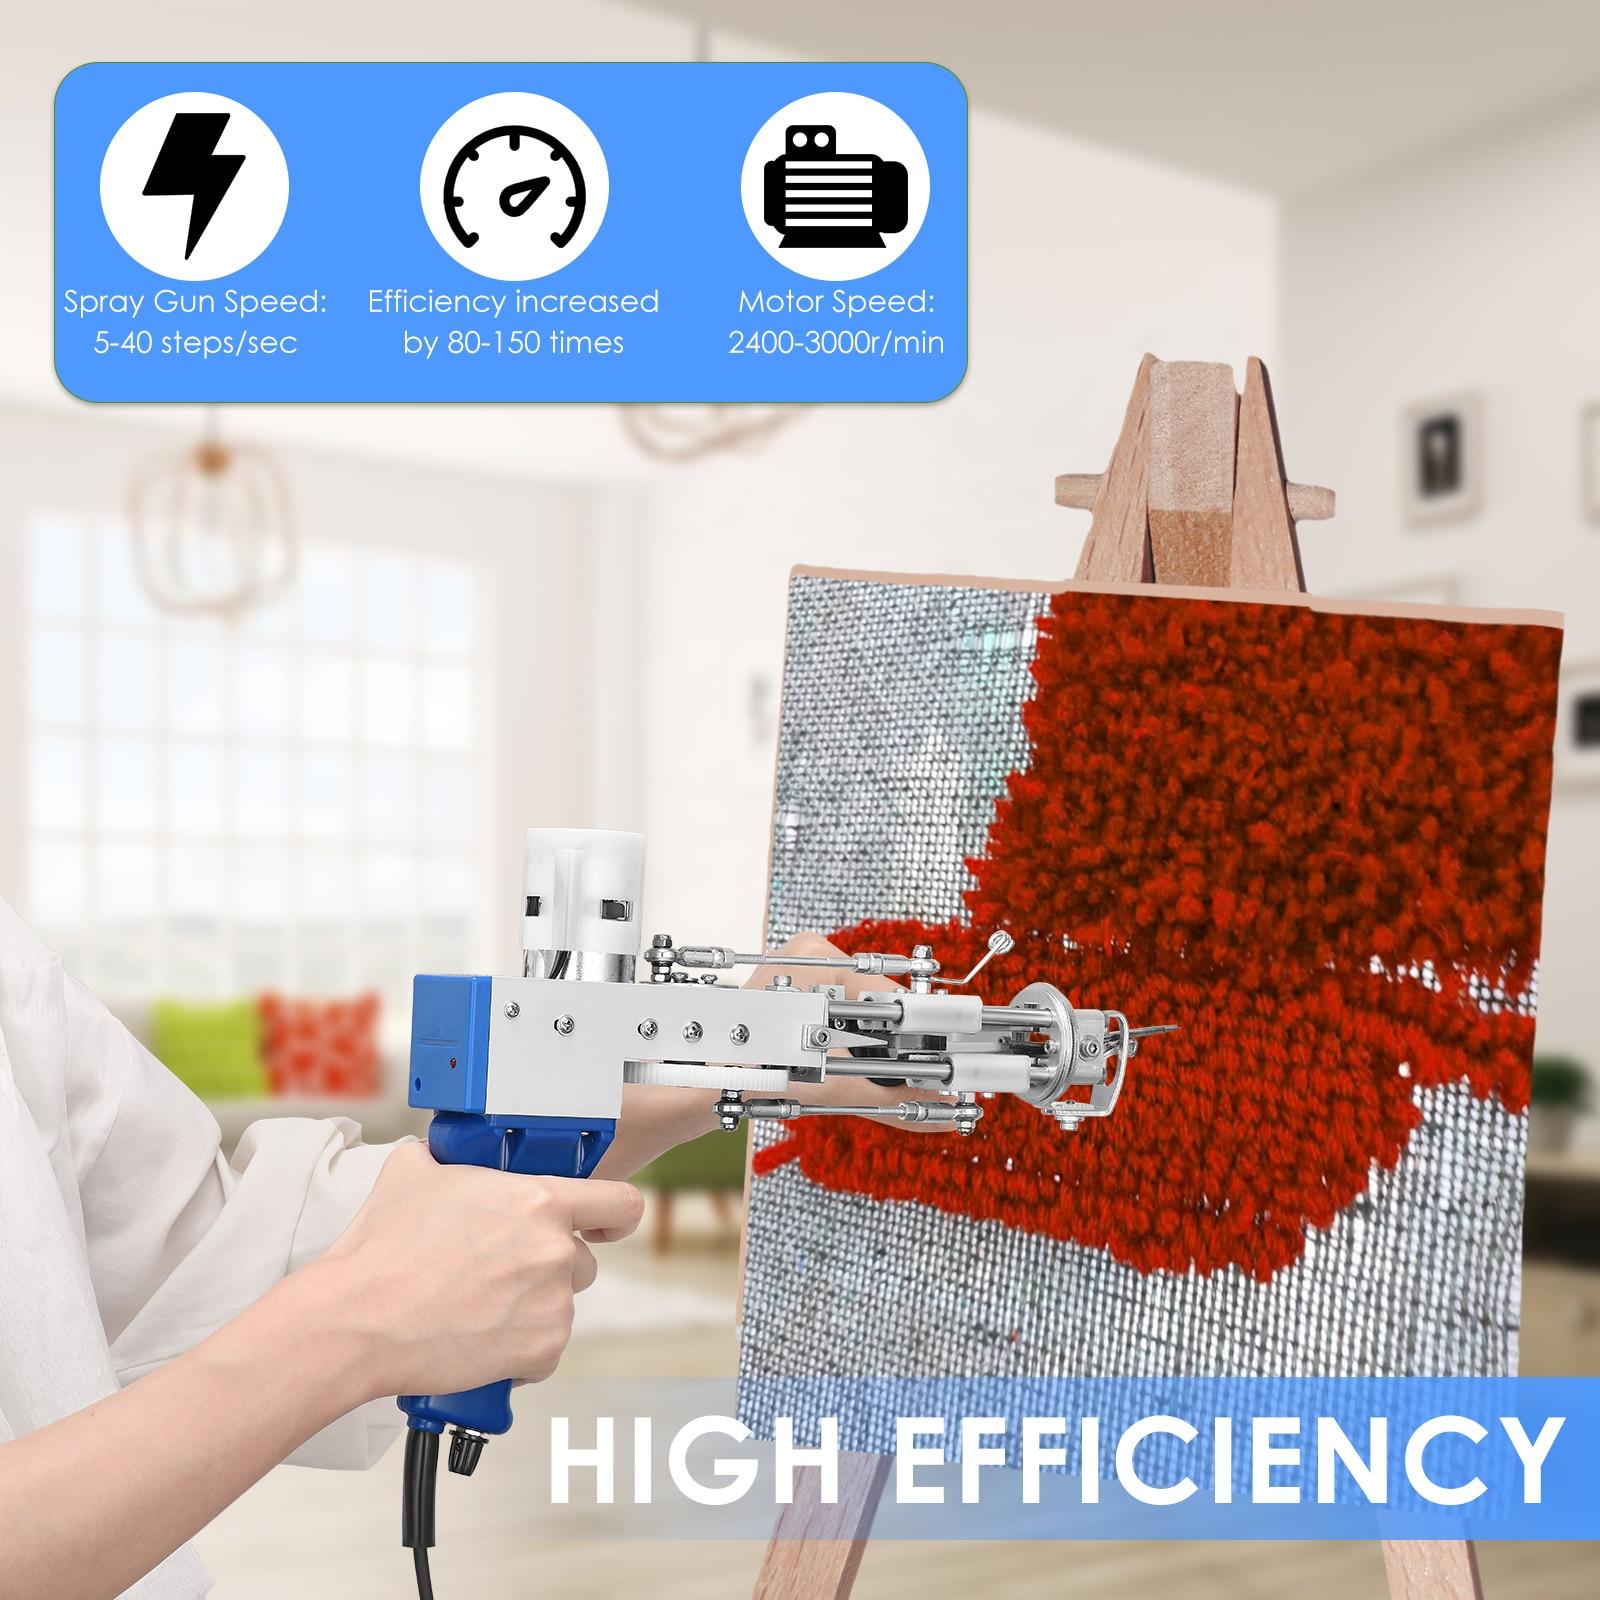 2 in 1 Tufting Gun Cut Pile and Loop Pile Electric Carpet RugGuns  Carpet Weaving Knitting Machine for DIY, Knitting enlarge